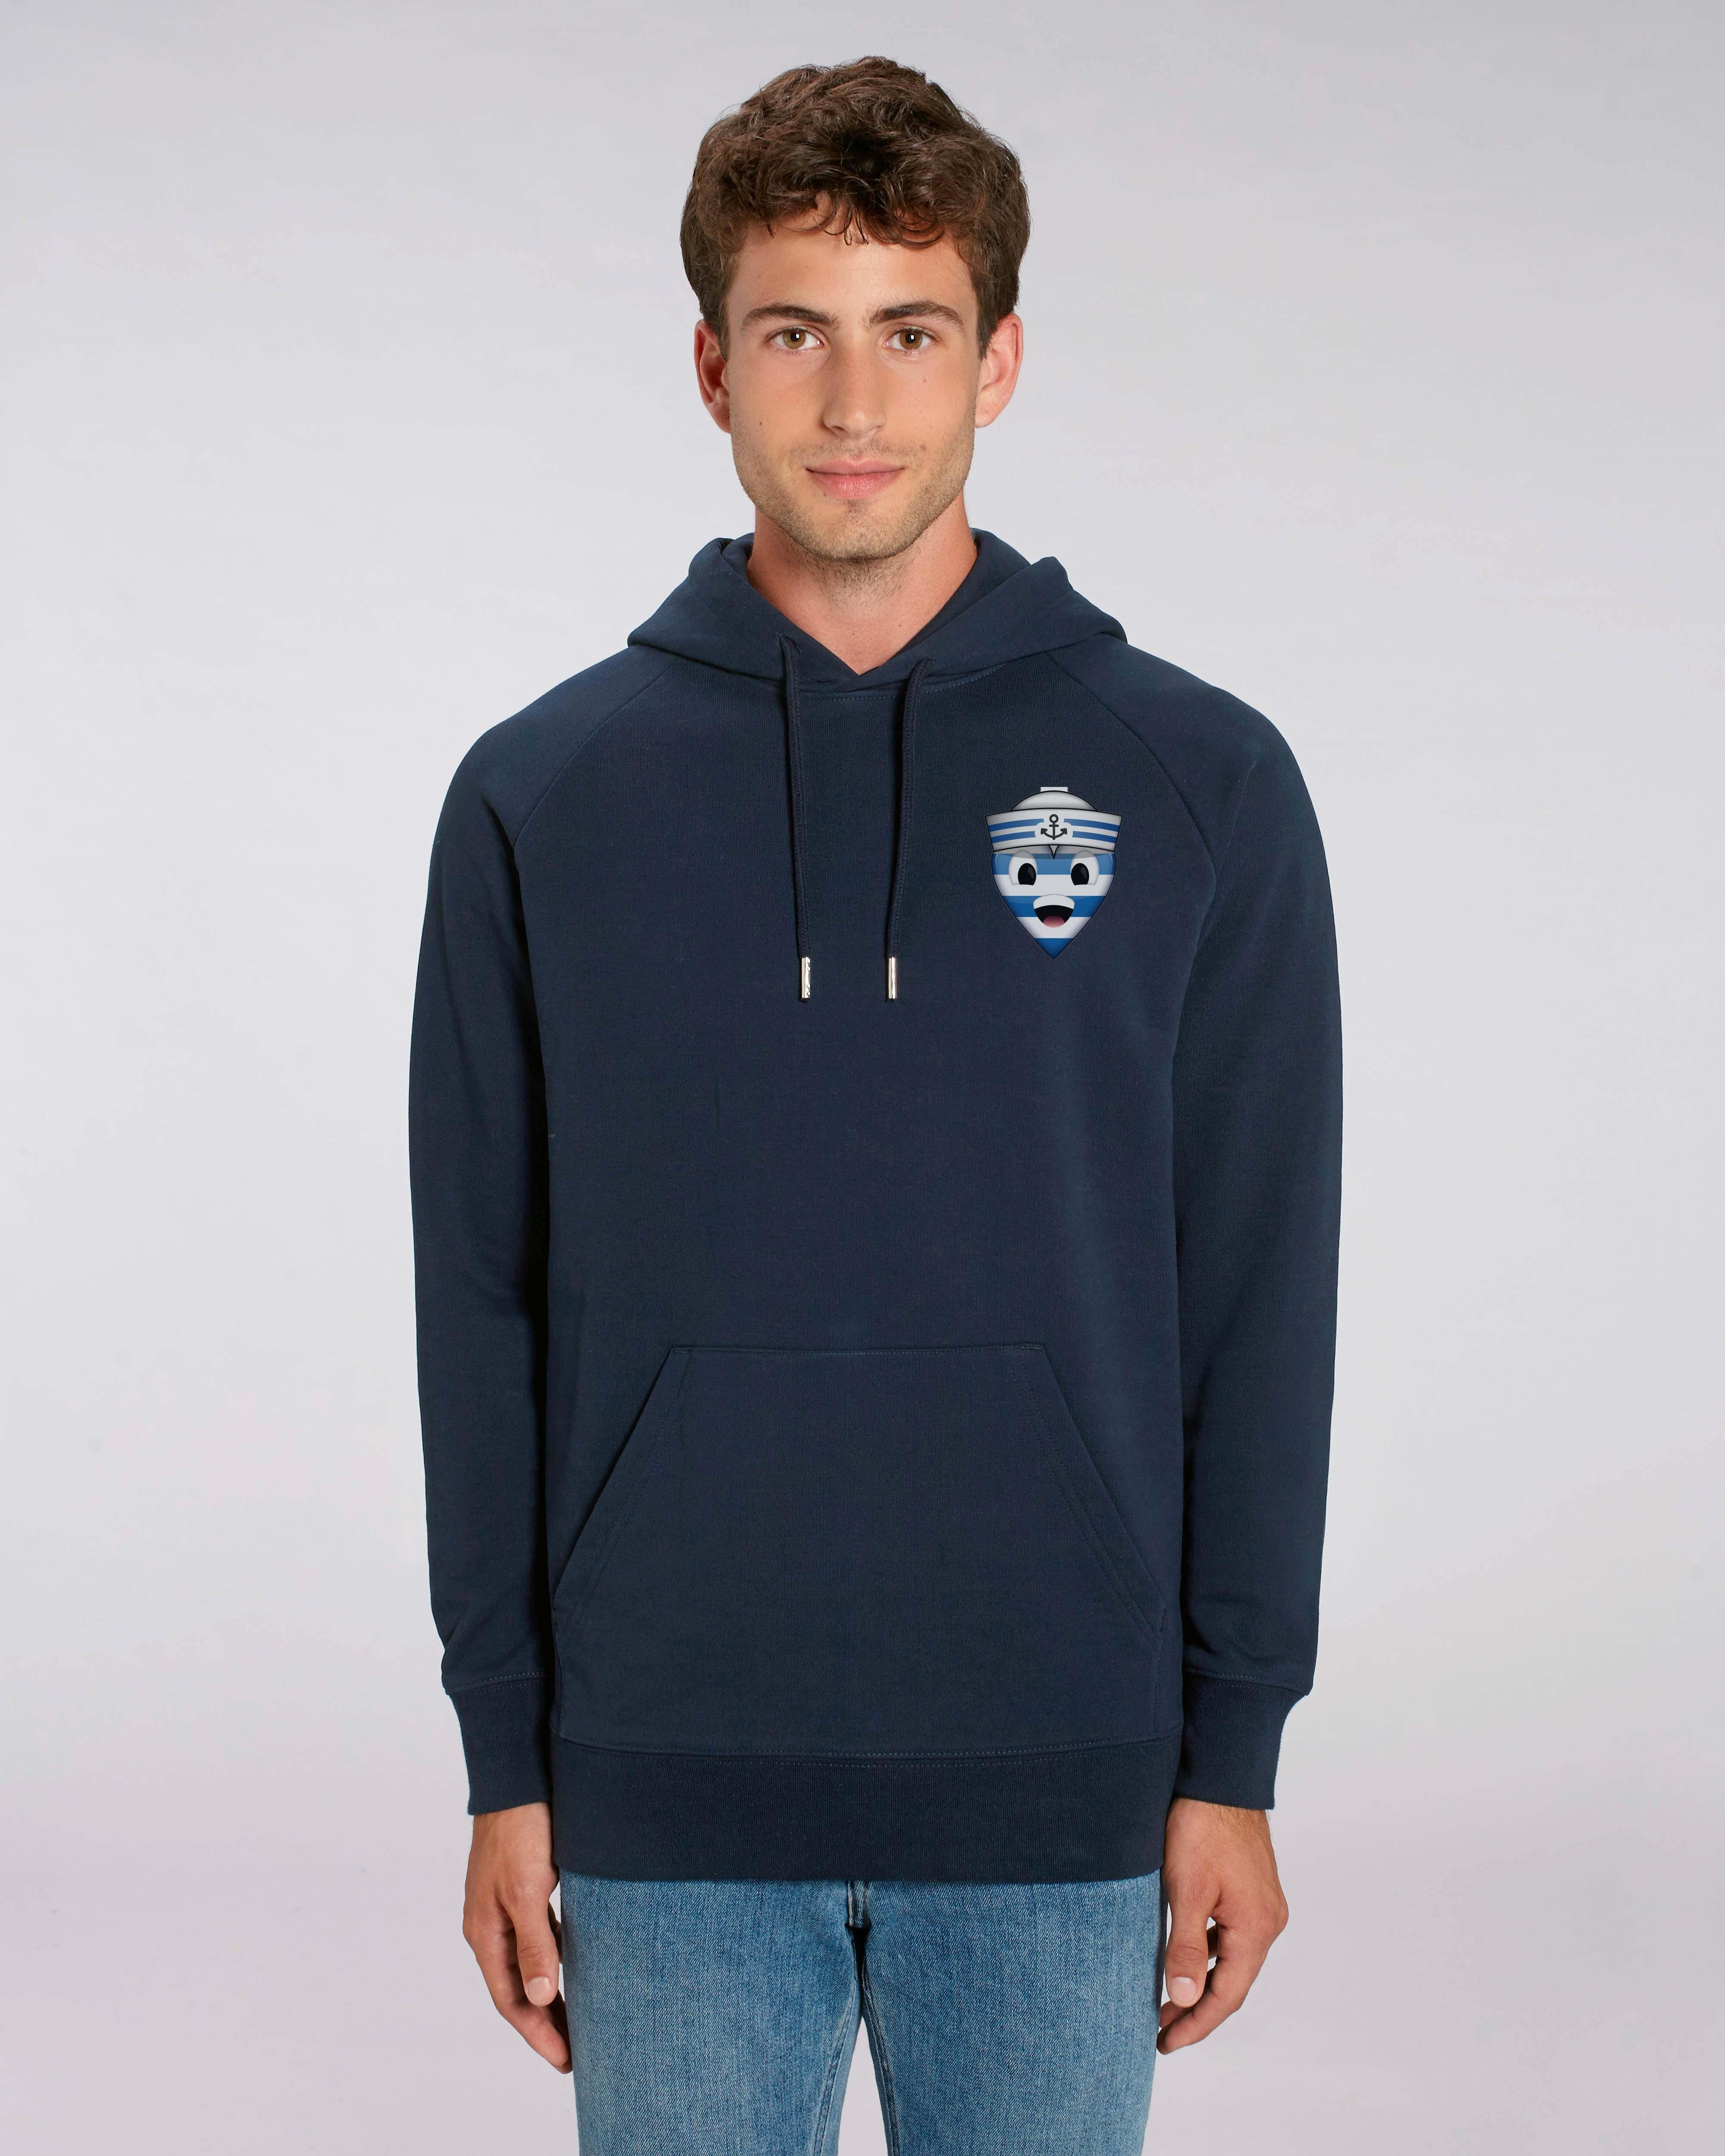 Sweat shirt à Capuche bleu foncé homme - navy hoodie